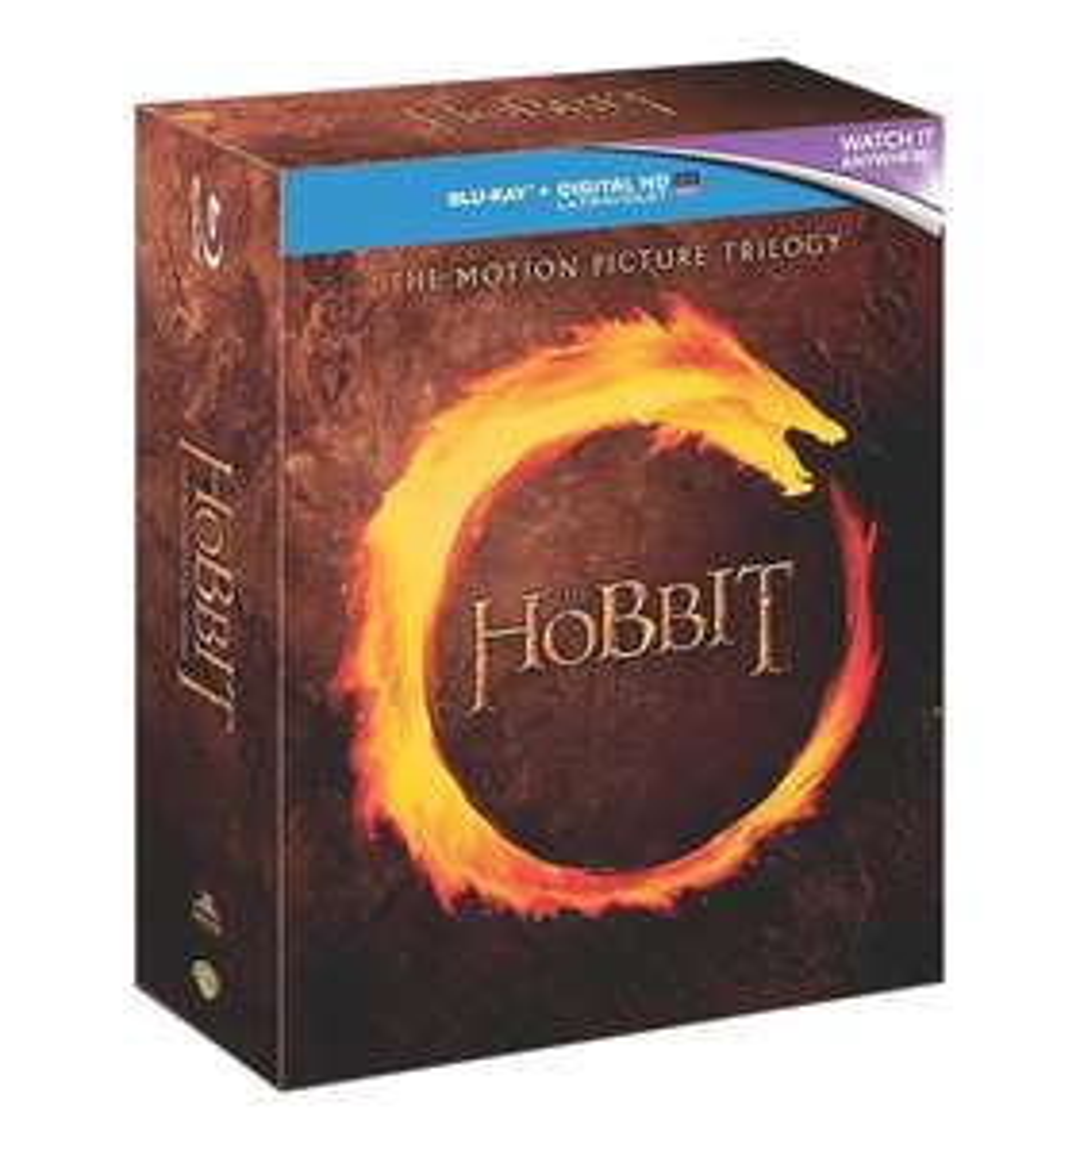 The Hobbit Trilogy Blu-Ray - AMAZON - £12.69 + £2.99 delivery non Prime @ Amazon